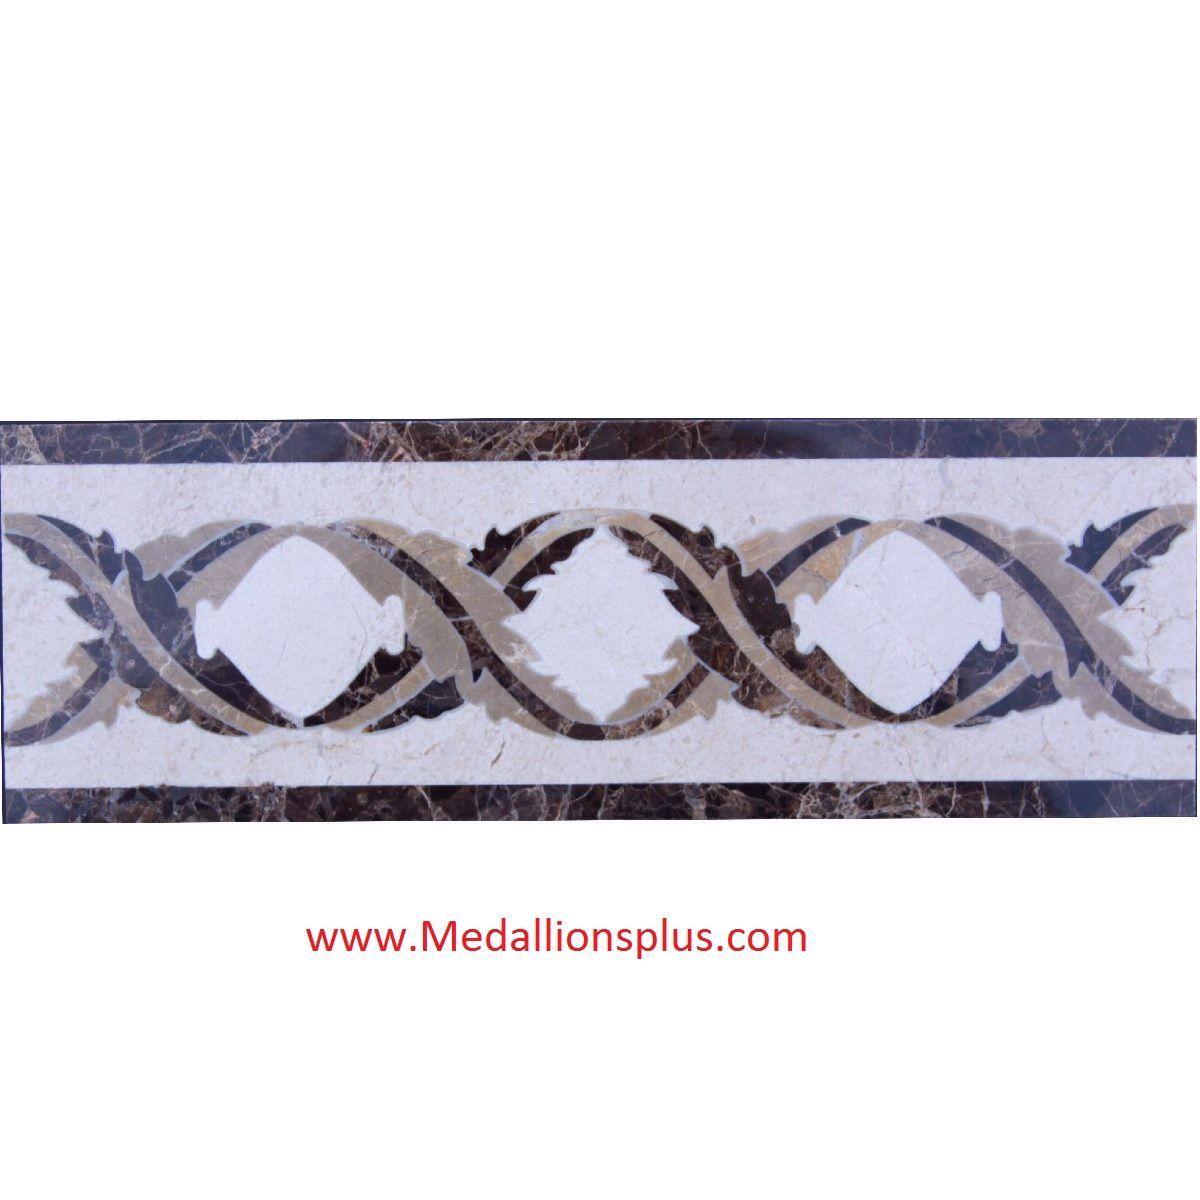 Daphne 4 x 12 waterjet tile border - MedallionsPlus.com ...